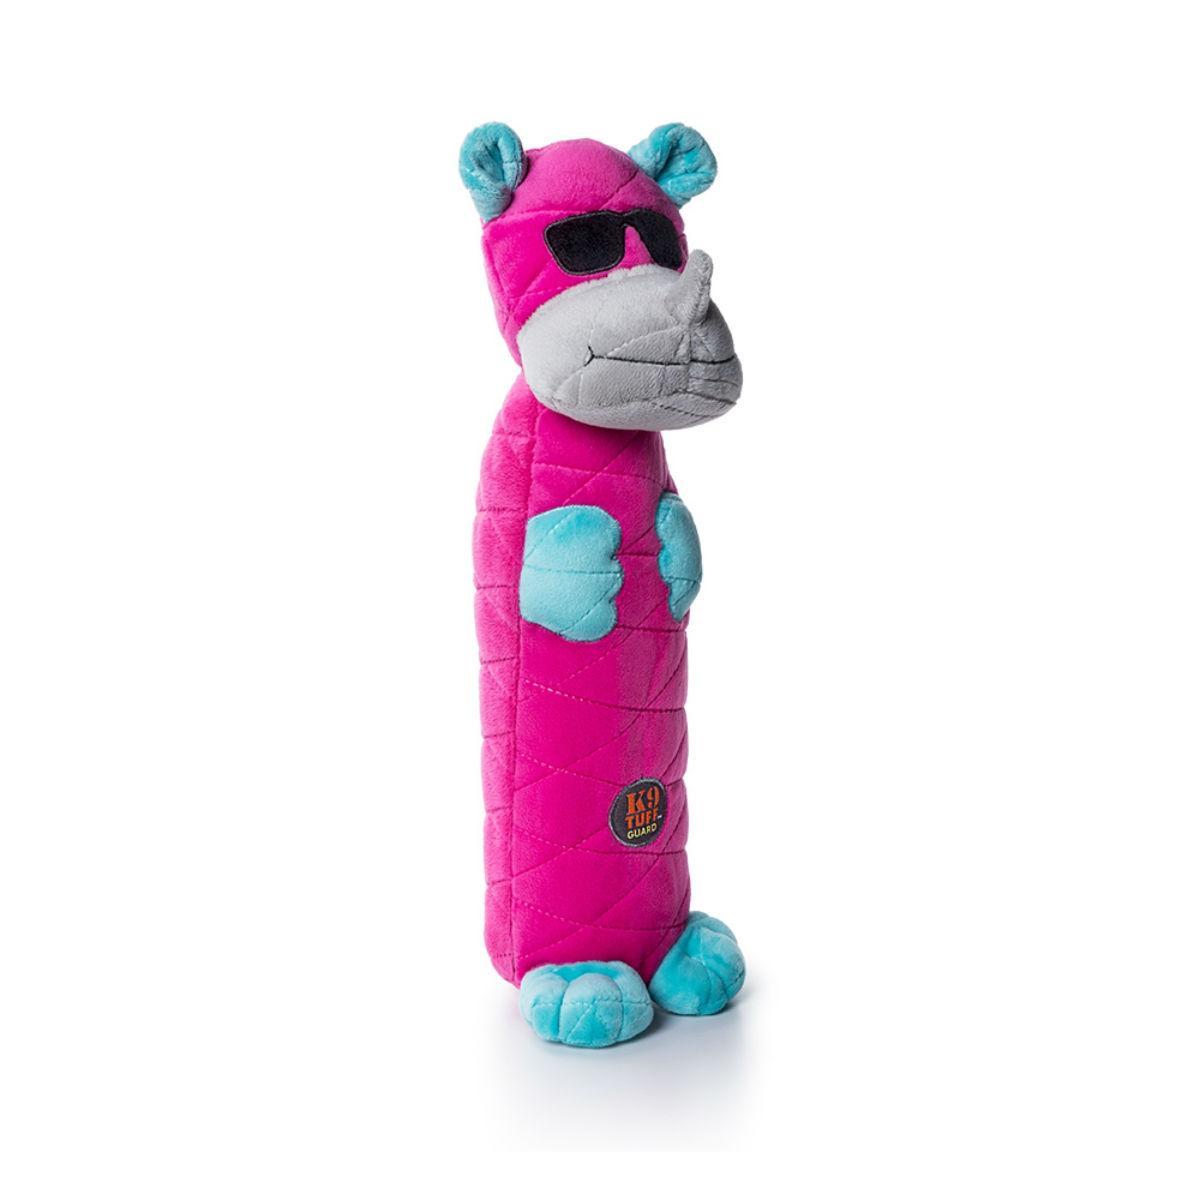 Charming Bottle Bros Durable Dog Toy - Rhino